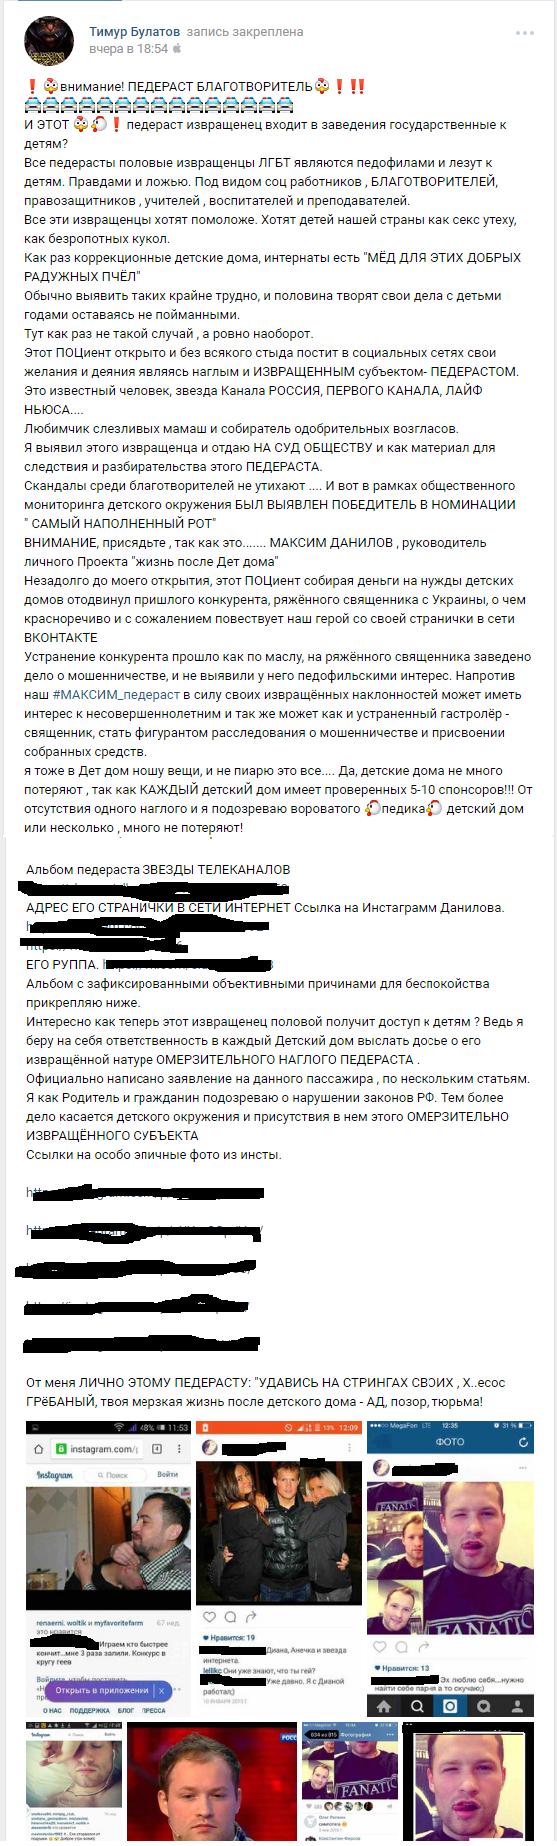 Активист теперь травит благотворителей Тимур булатов, Максим данилов, Активист, Угроза, Длиннопост